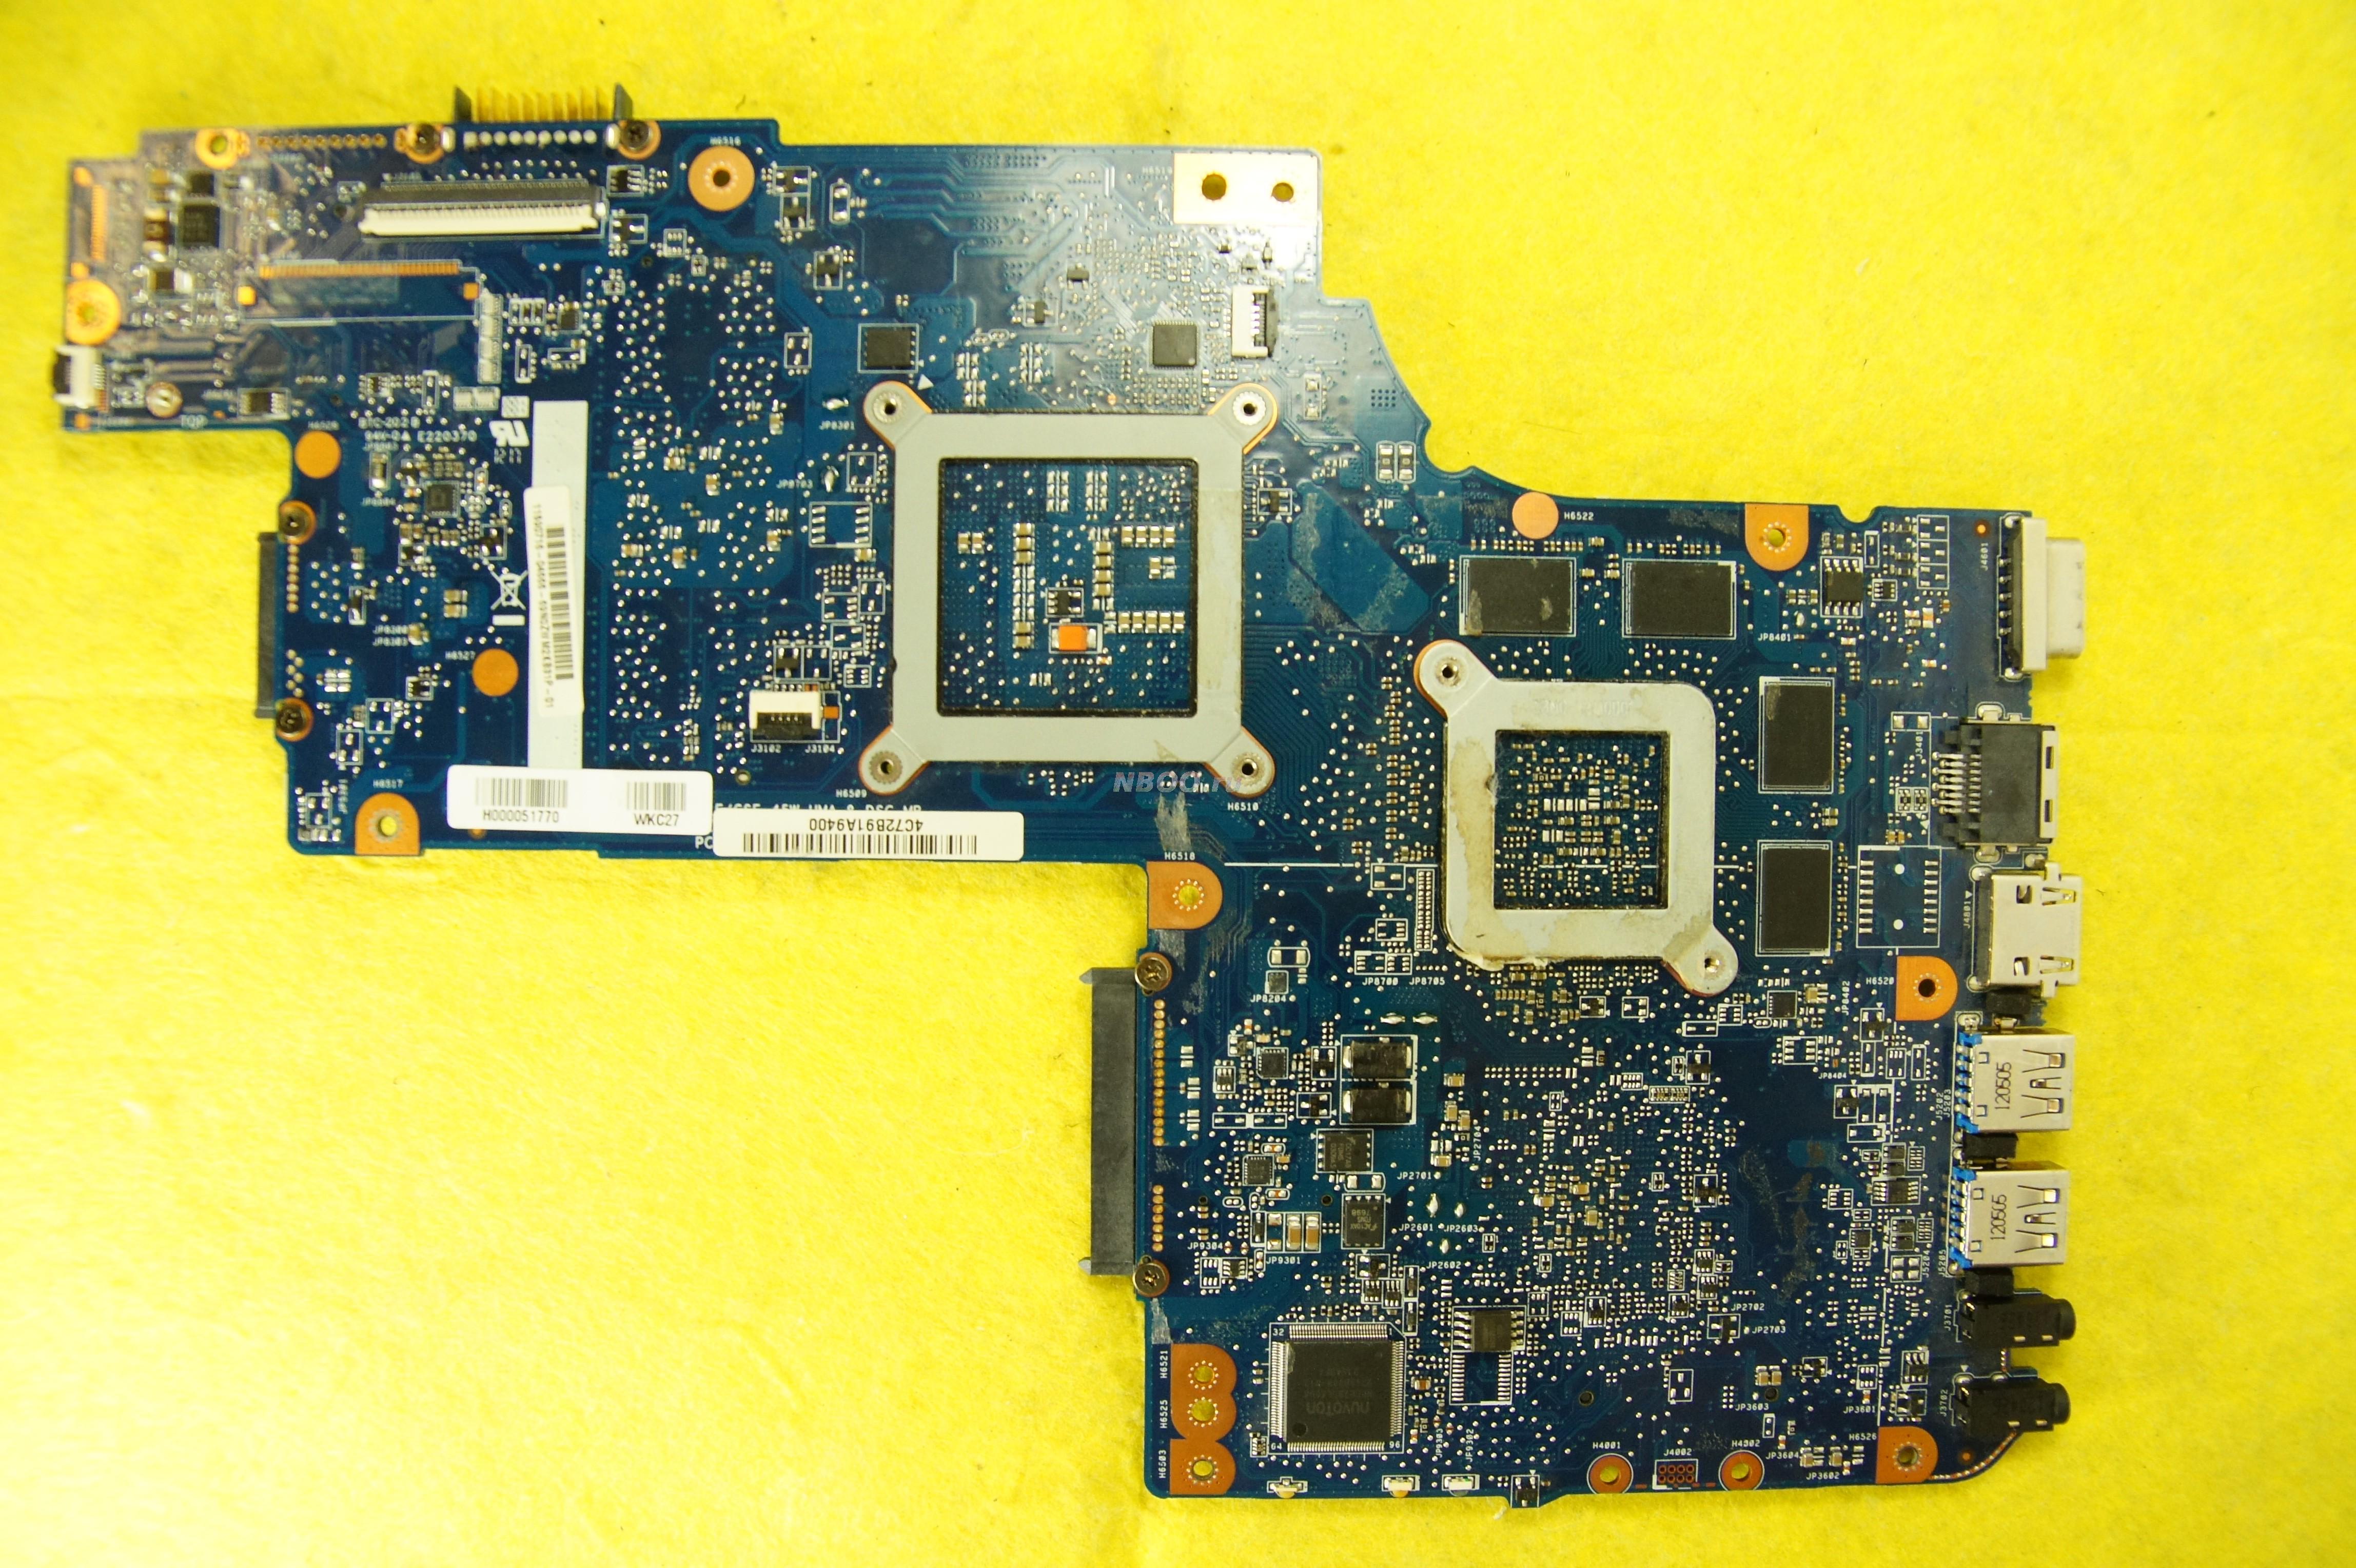 Материнская плата PLF/CSF / HM76 / HD6770 / 2GB для Toshiba Satellite C850, L850